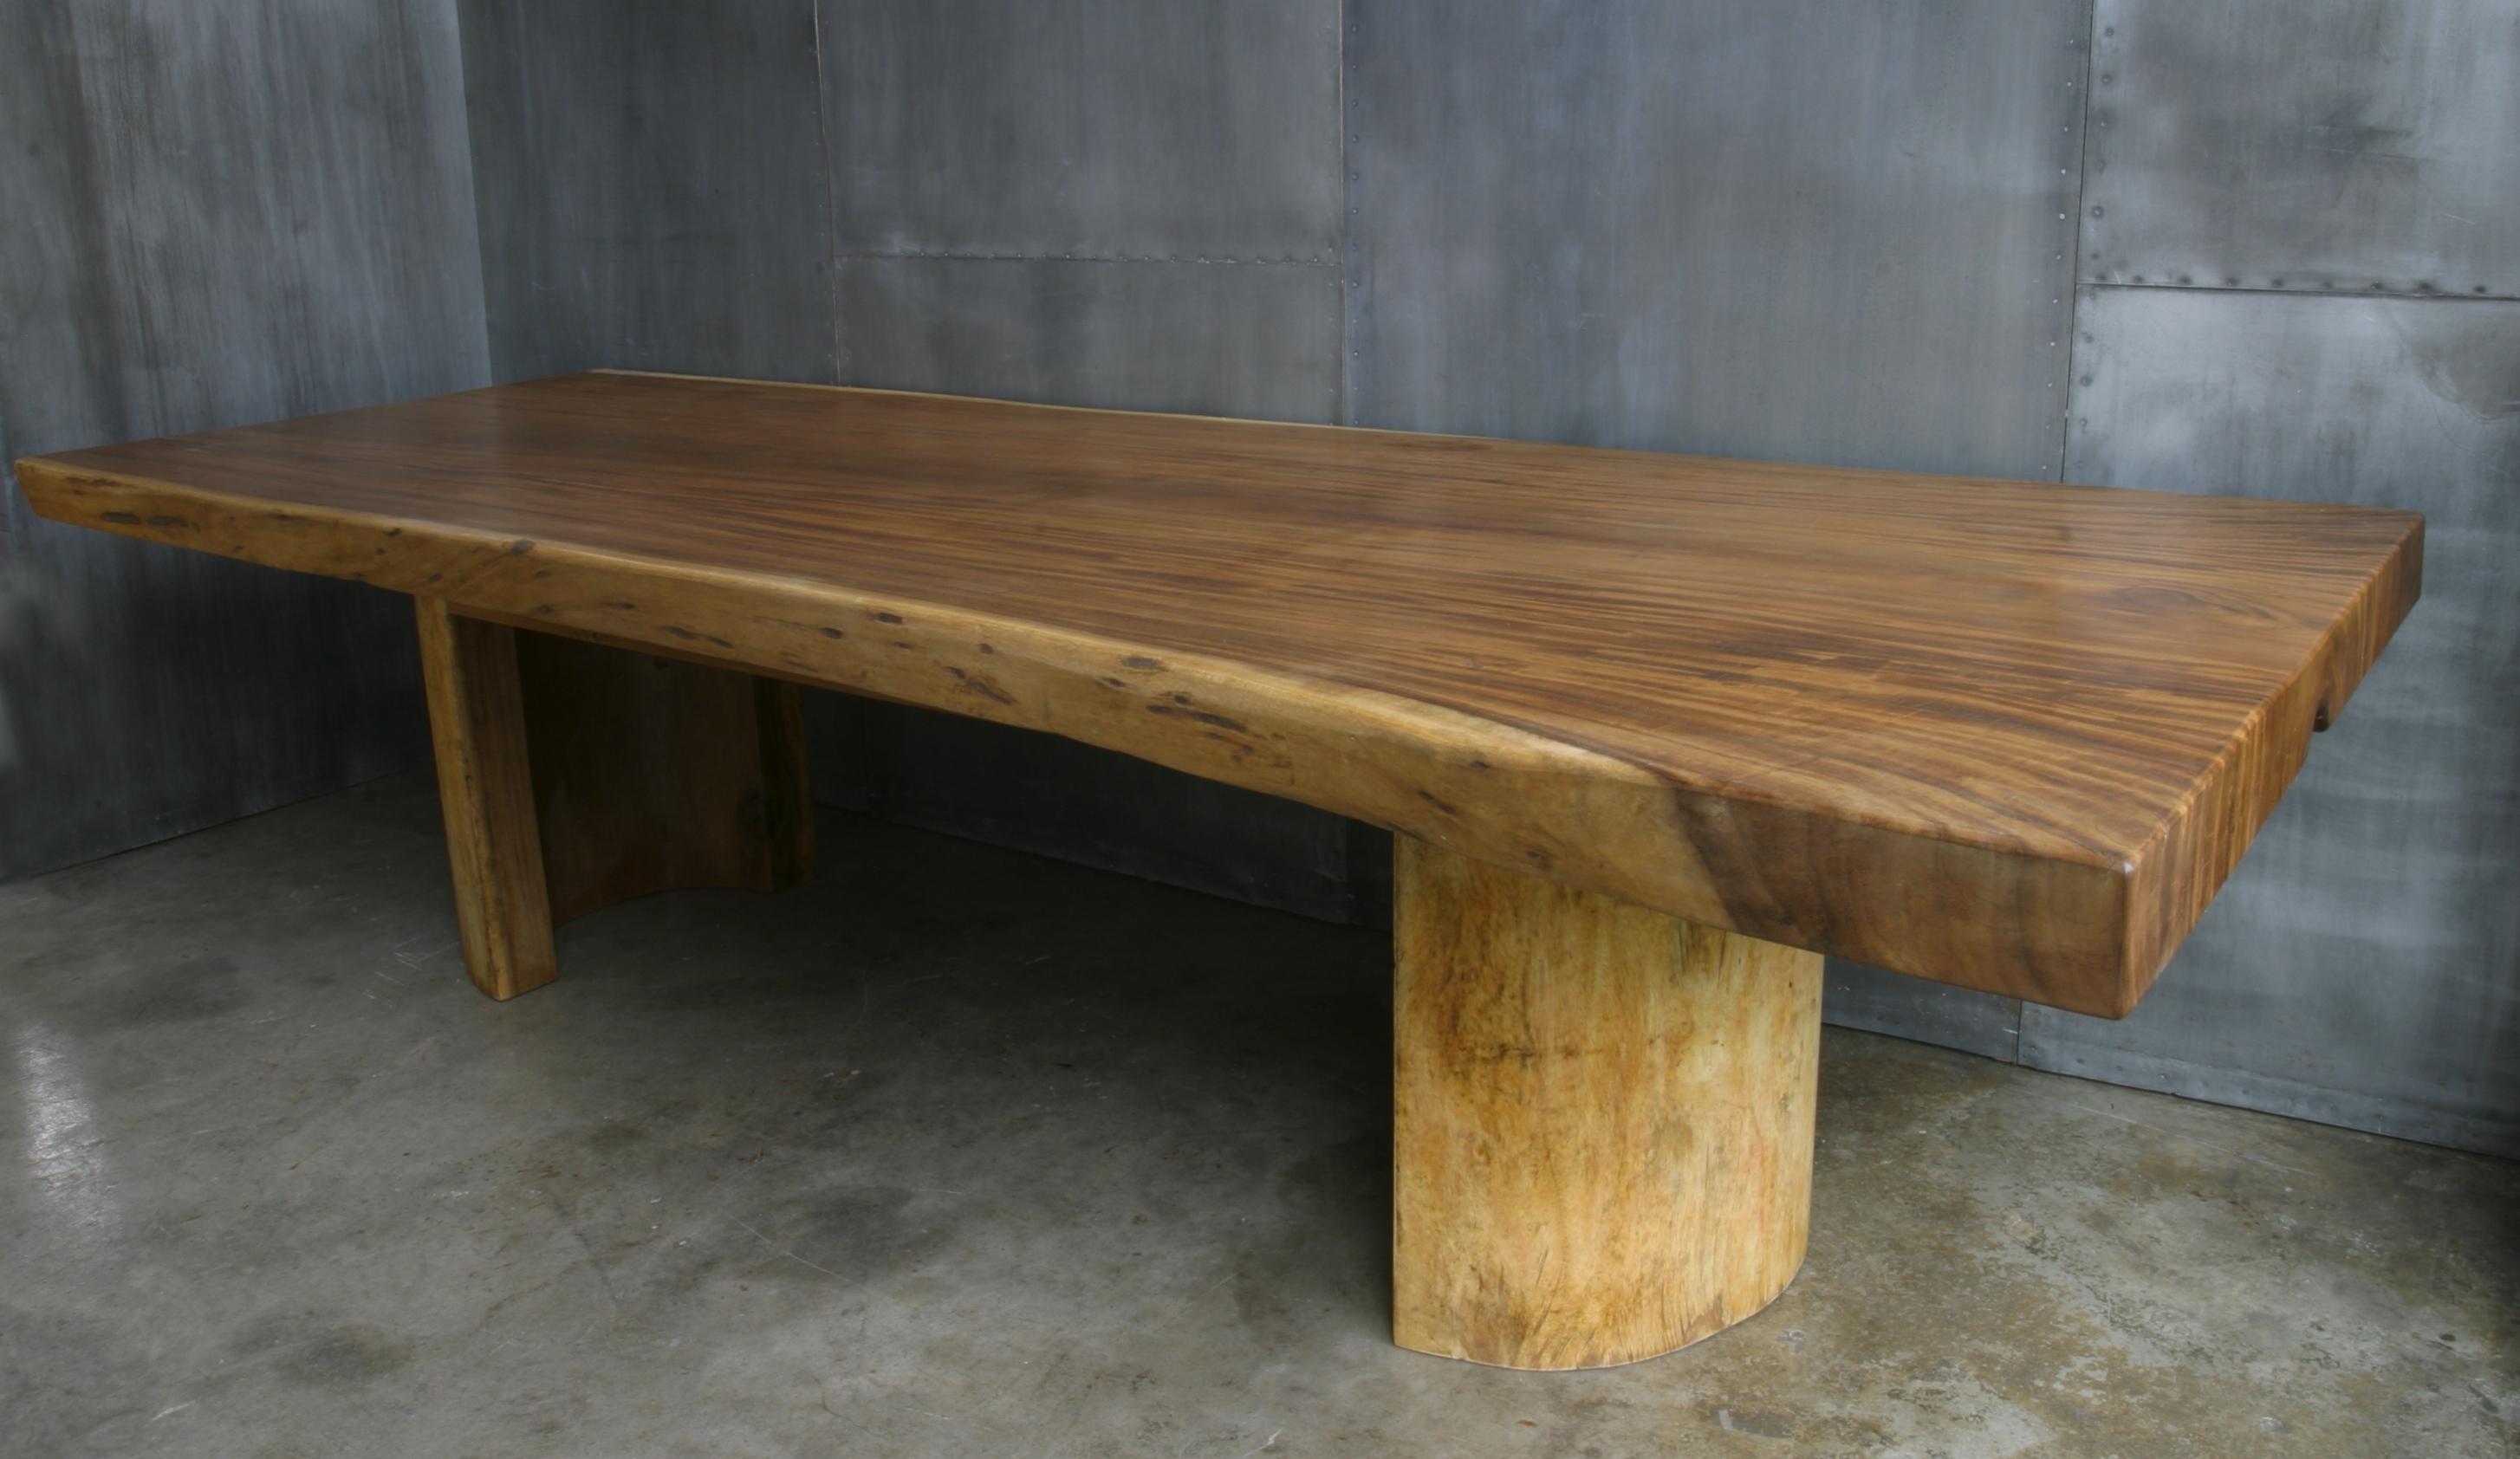 Yc29 mesa 1 pieza madera hierro cat logo concha bay - Tableros de madera maciza para mesas ...